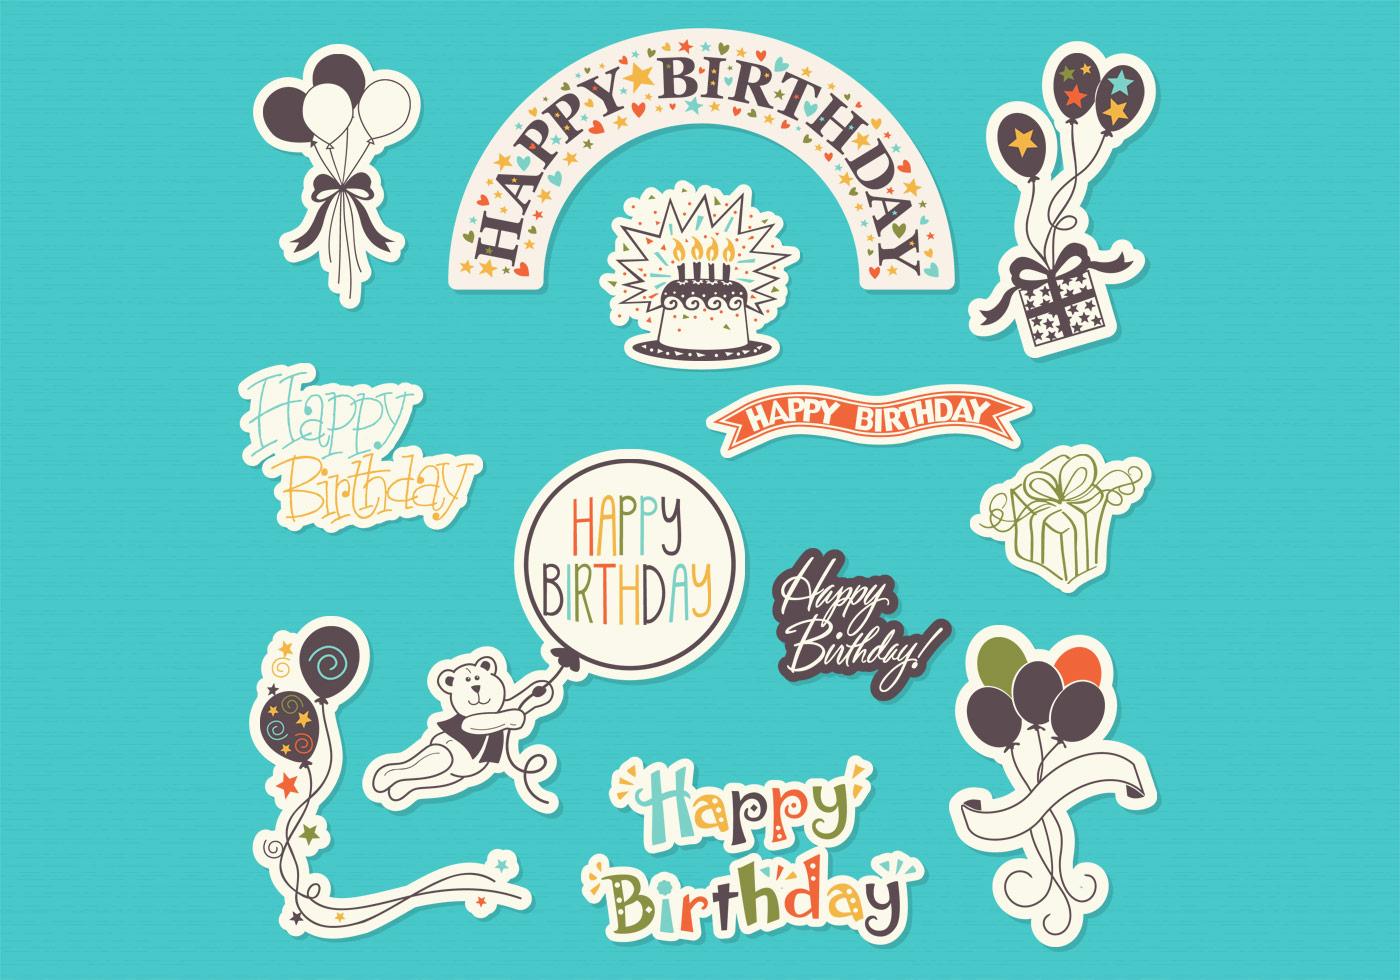 Happy Birthday Sticker Set Psd Free Photoshop Brushes At